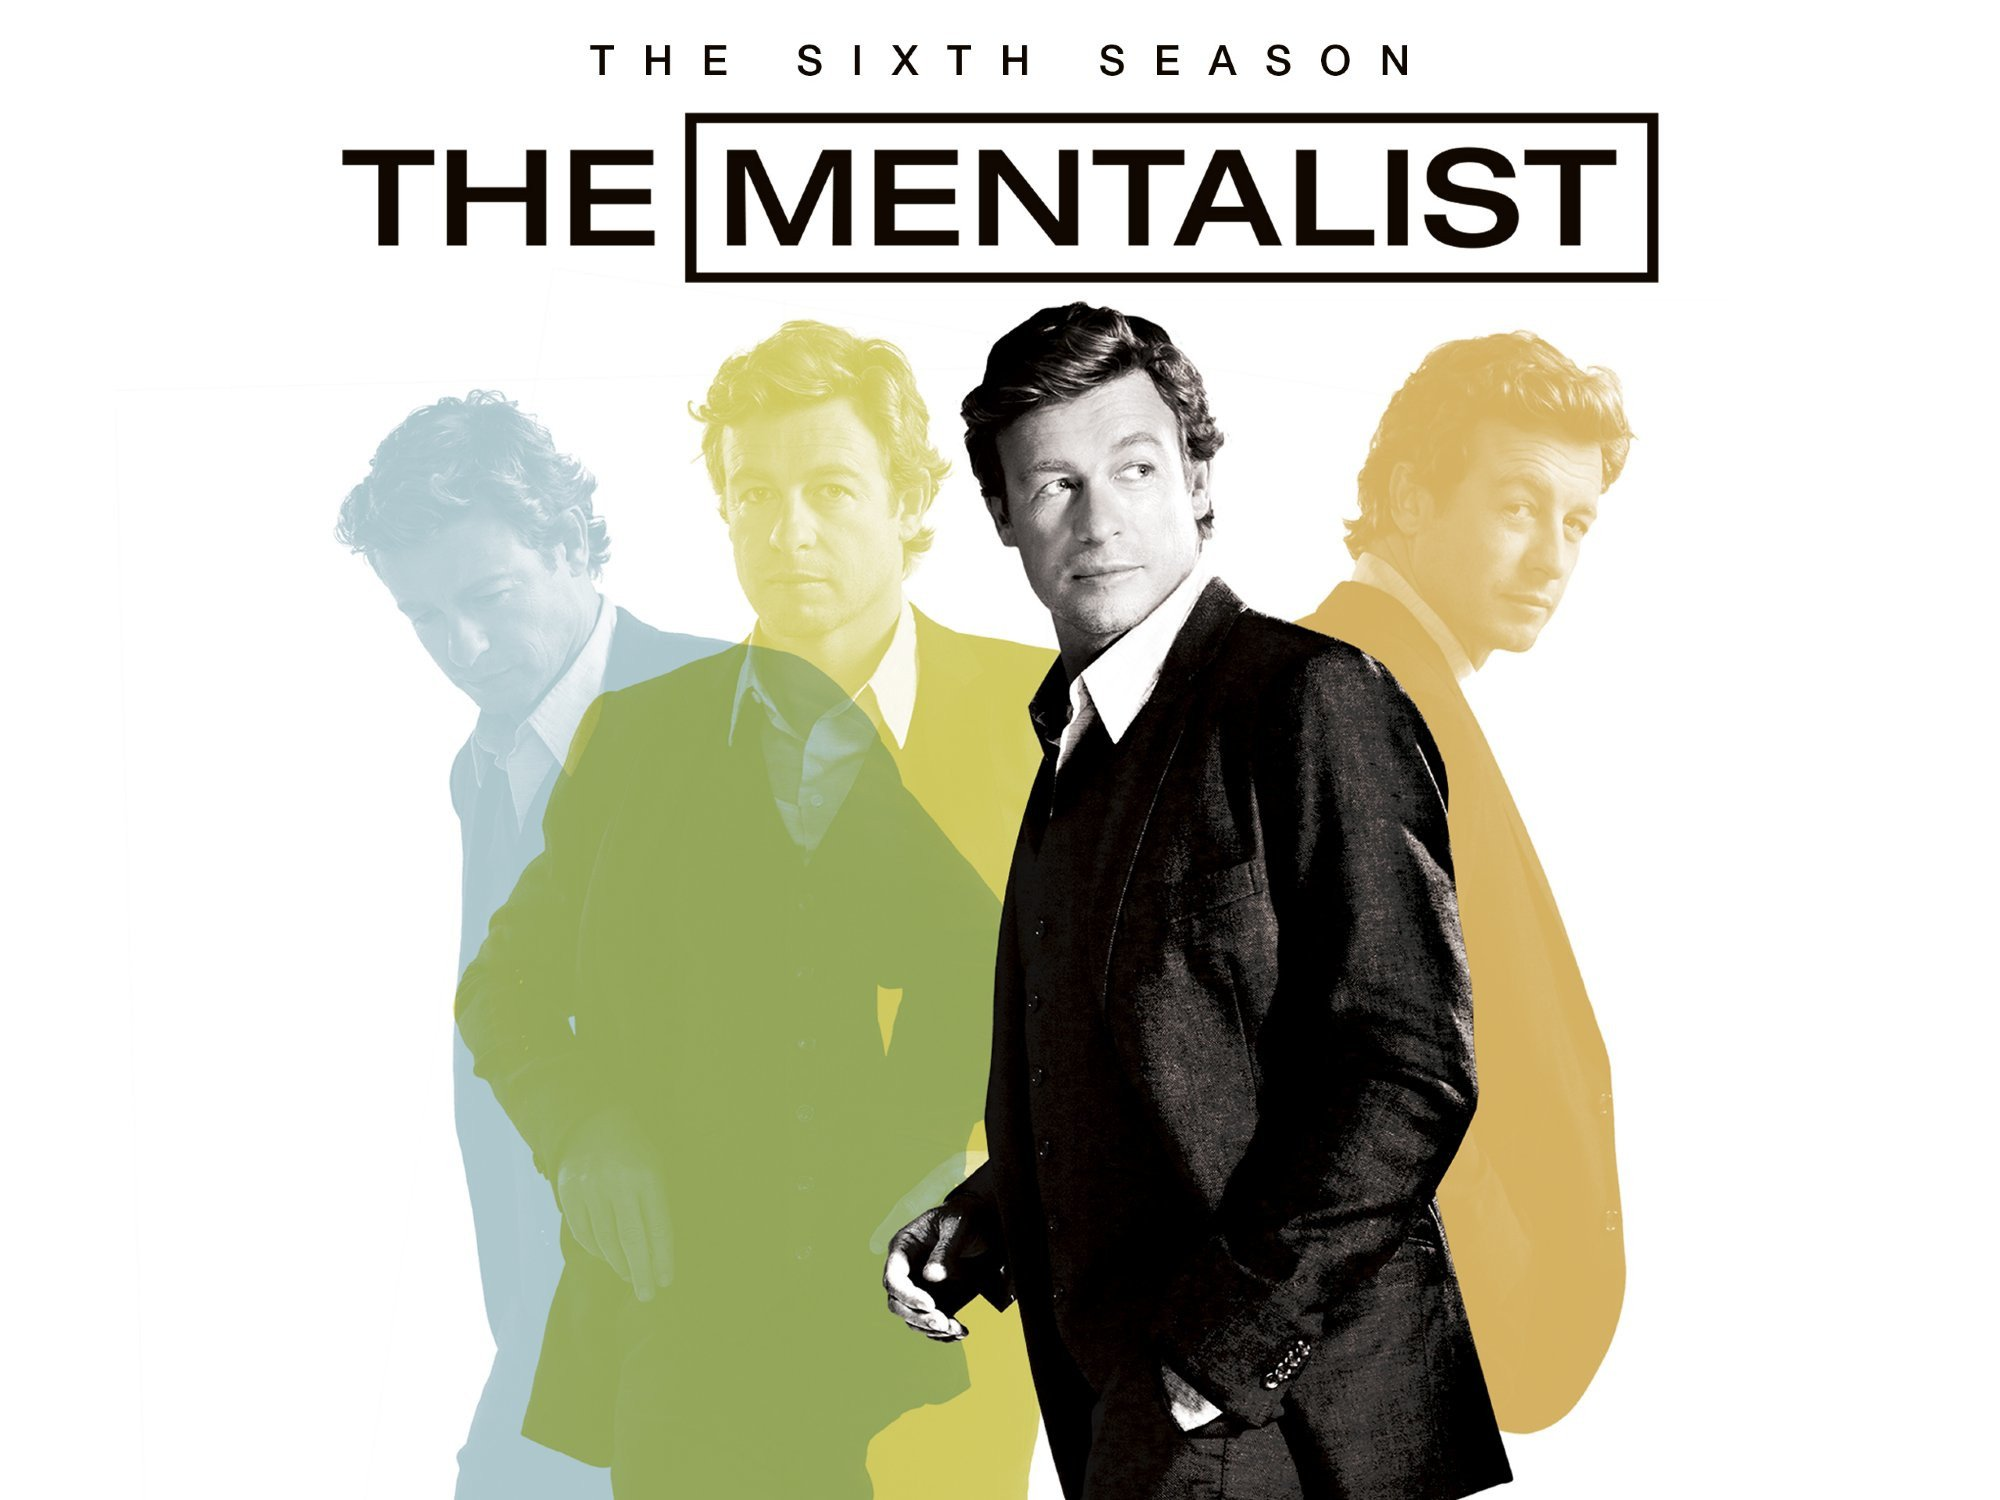 Amazon co uk: Watch The Mentalist - Season 6 | Prime Video